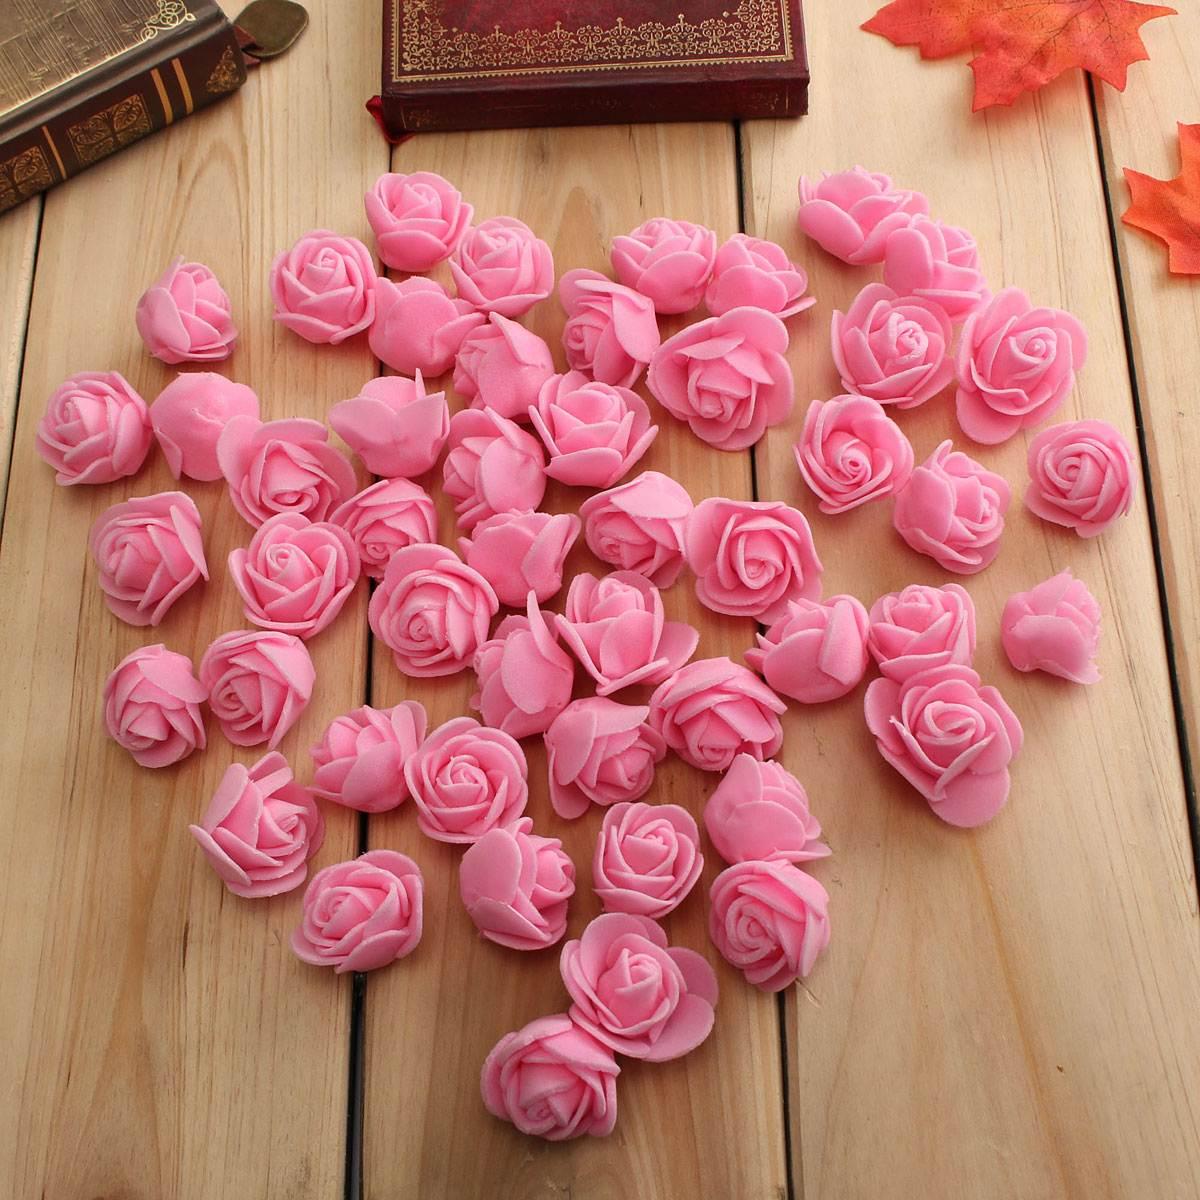 Wholesale Price 50 PCS/Bag PE Foam Rose Flower Head Handmade DIY Wedding Home Decoration Top Grade(China (Mainland))